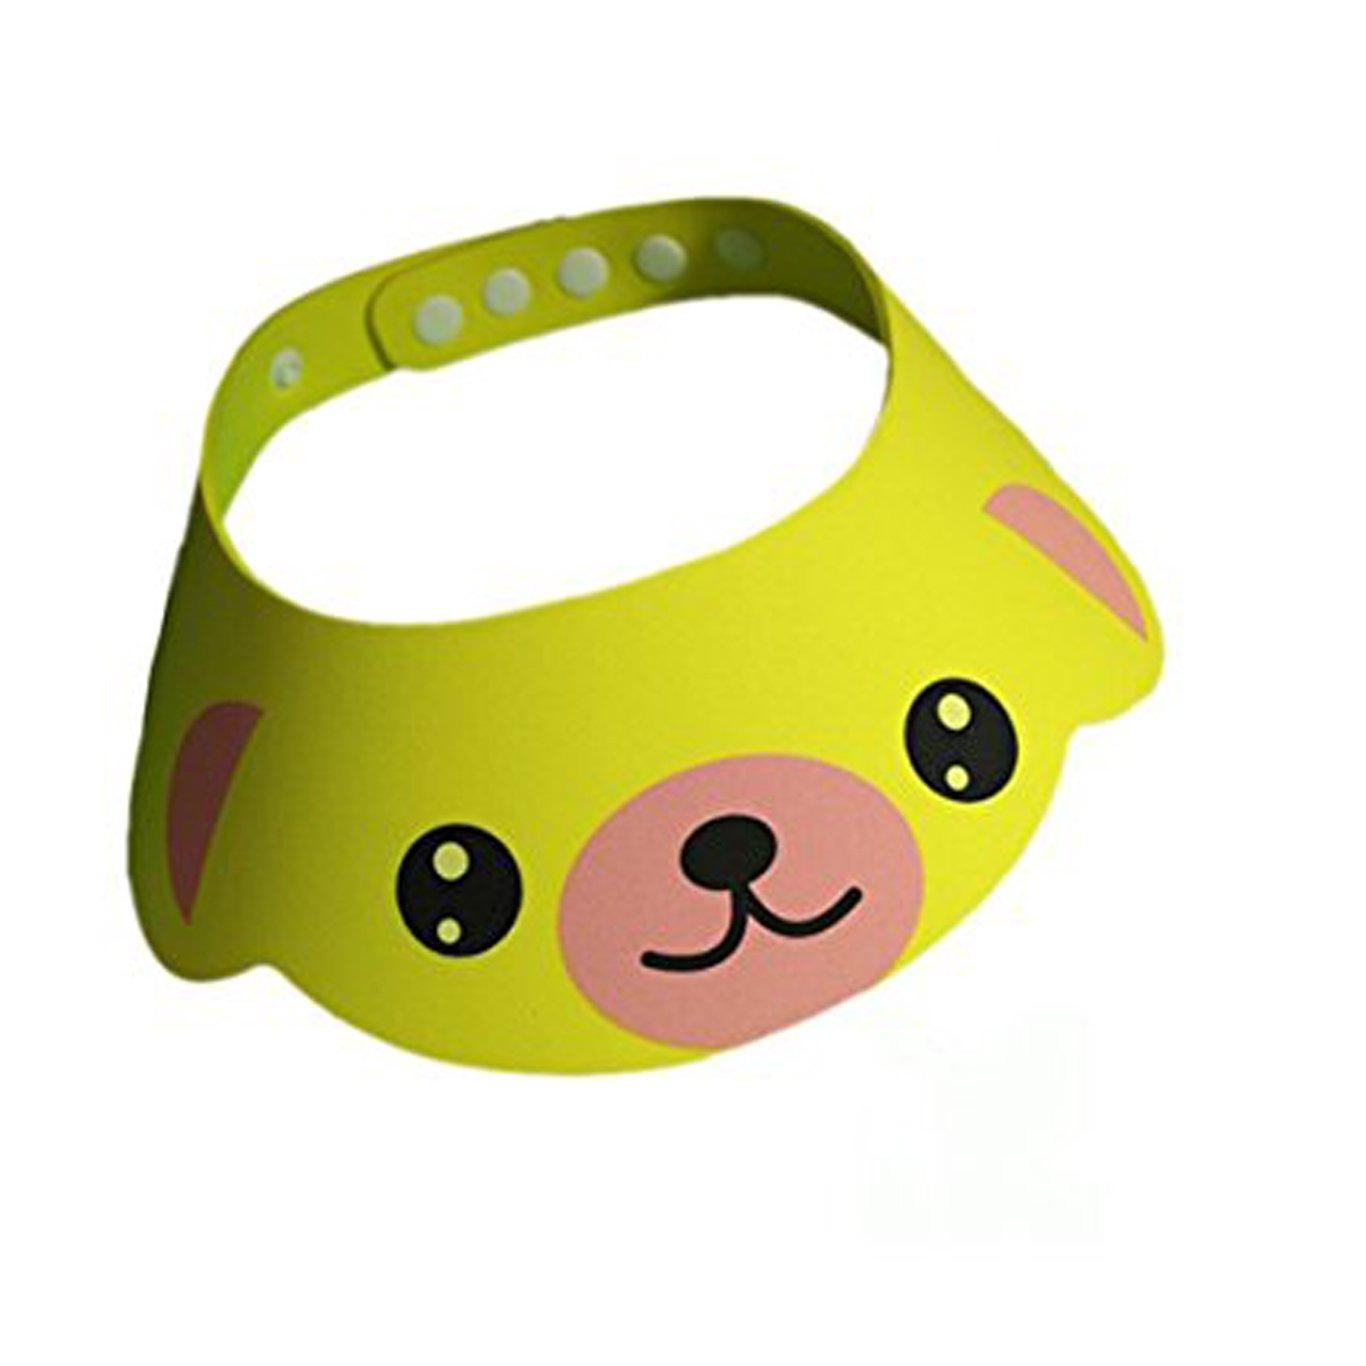 YUNQI Baby Kids Bath Shampoo Protect Hat Cartoon Children Adjustable Soft Bathing Shower Cap Sunshade Shield Visor Yellow (Yellow)